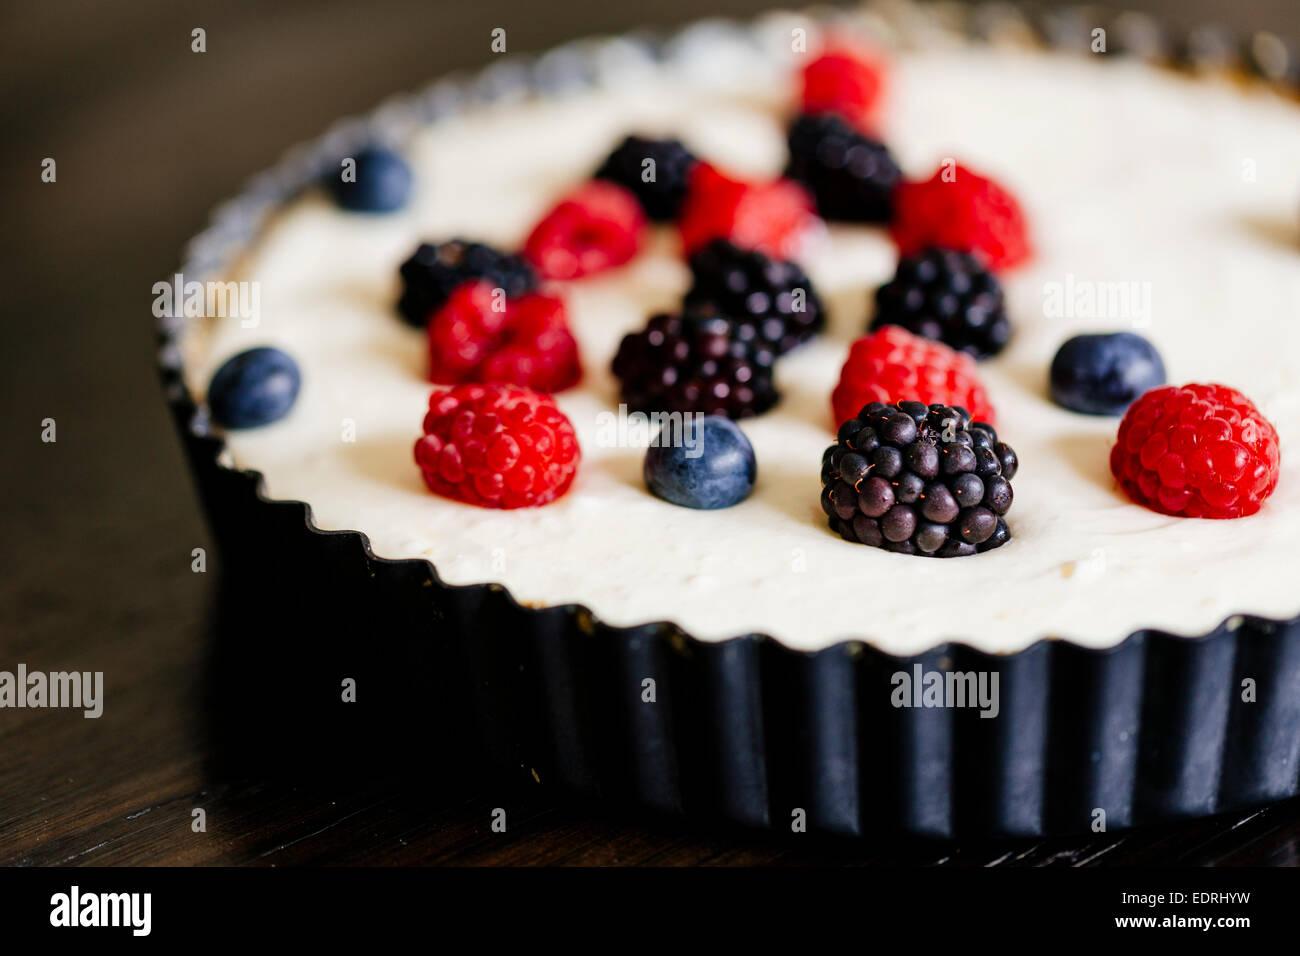 Berry und Mascarpone Torte Stockbild